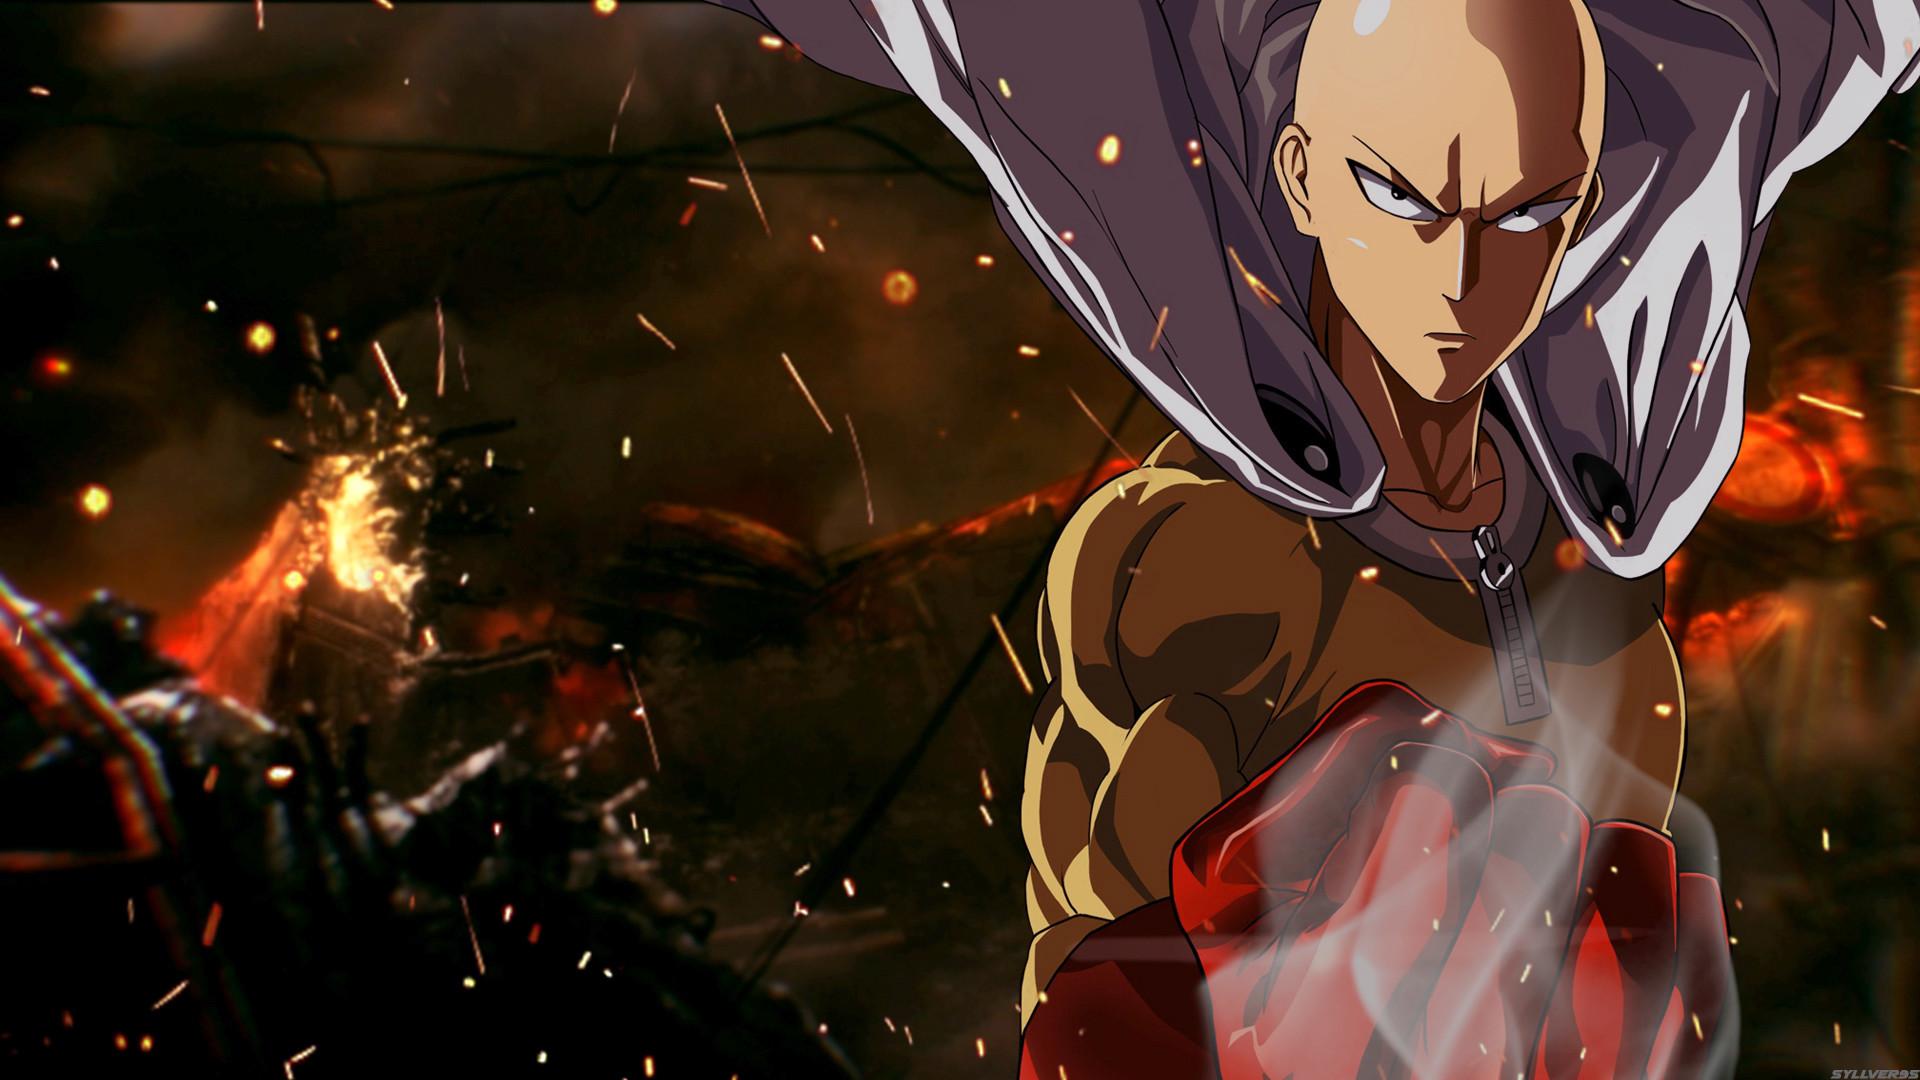 Anime – One-Punch Man Saitama (One-Punch Man) Anime Wallpaper